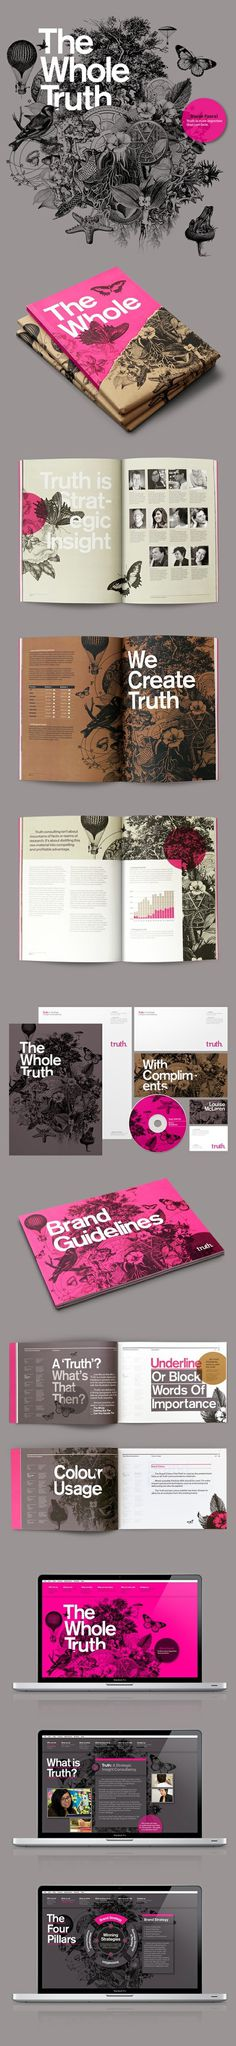 Truth Branding by Socio Design